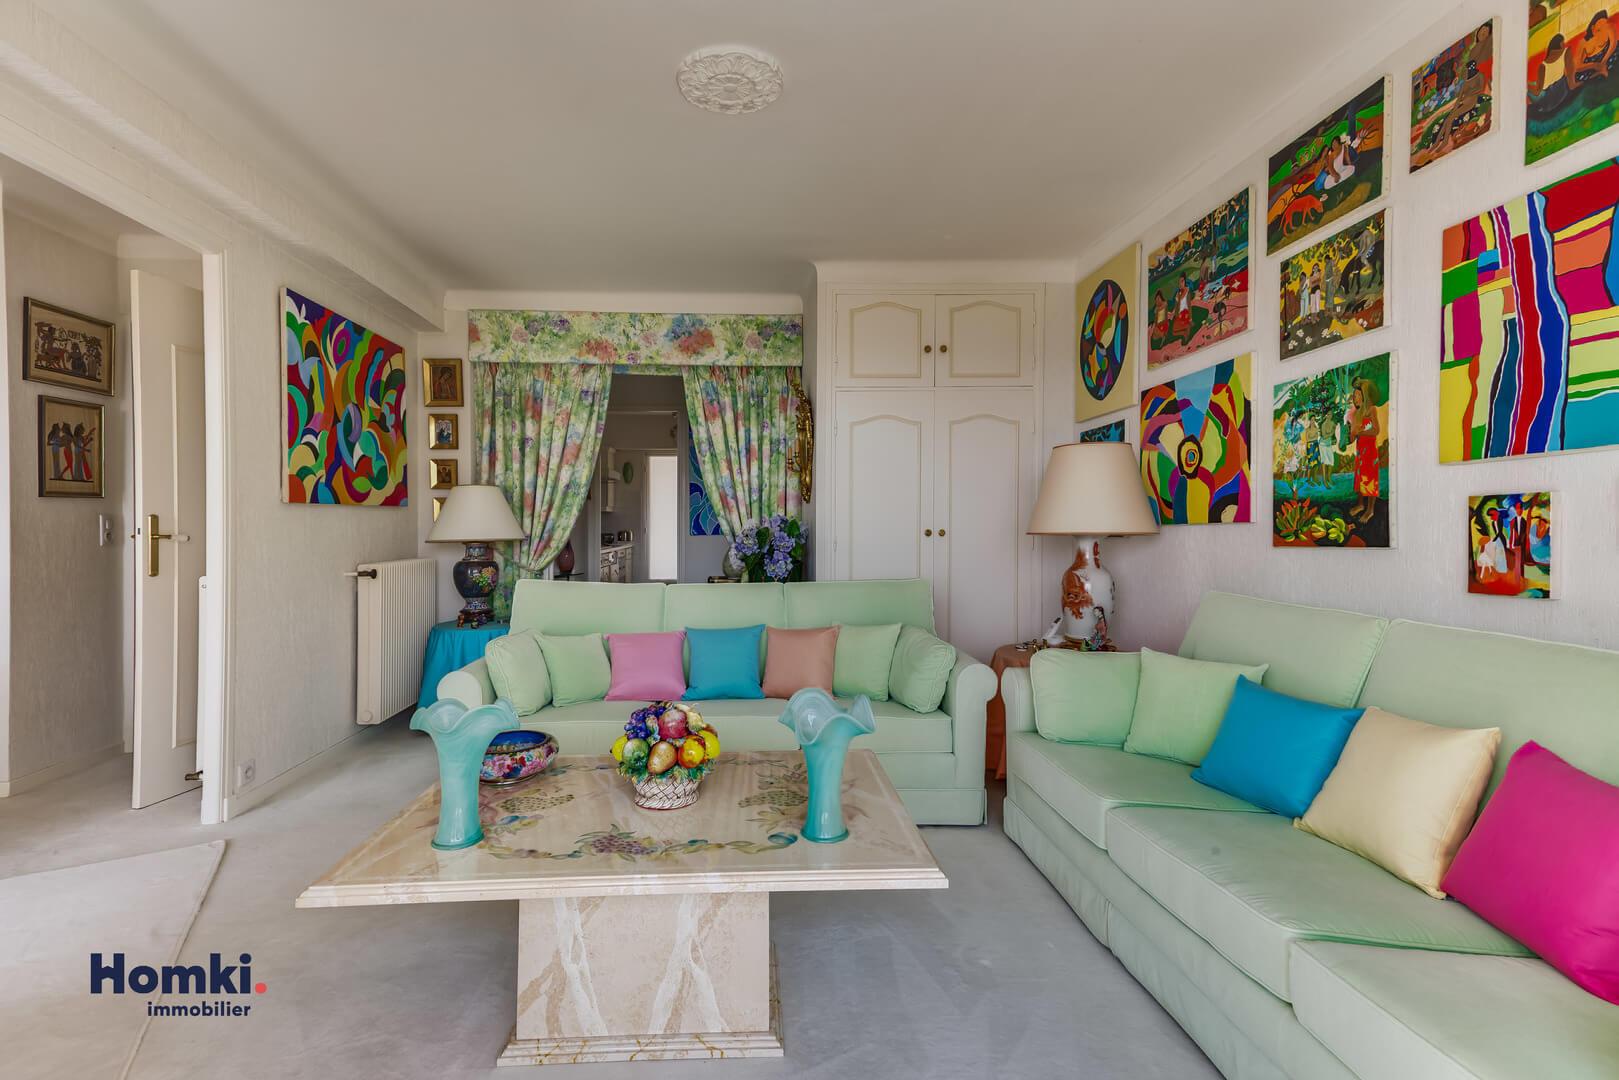 Vente appartement Grasse T3 06520 French Riviera_7